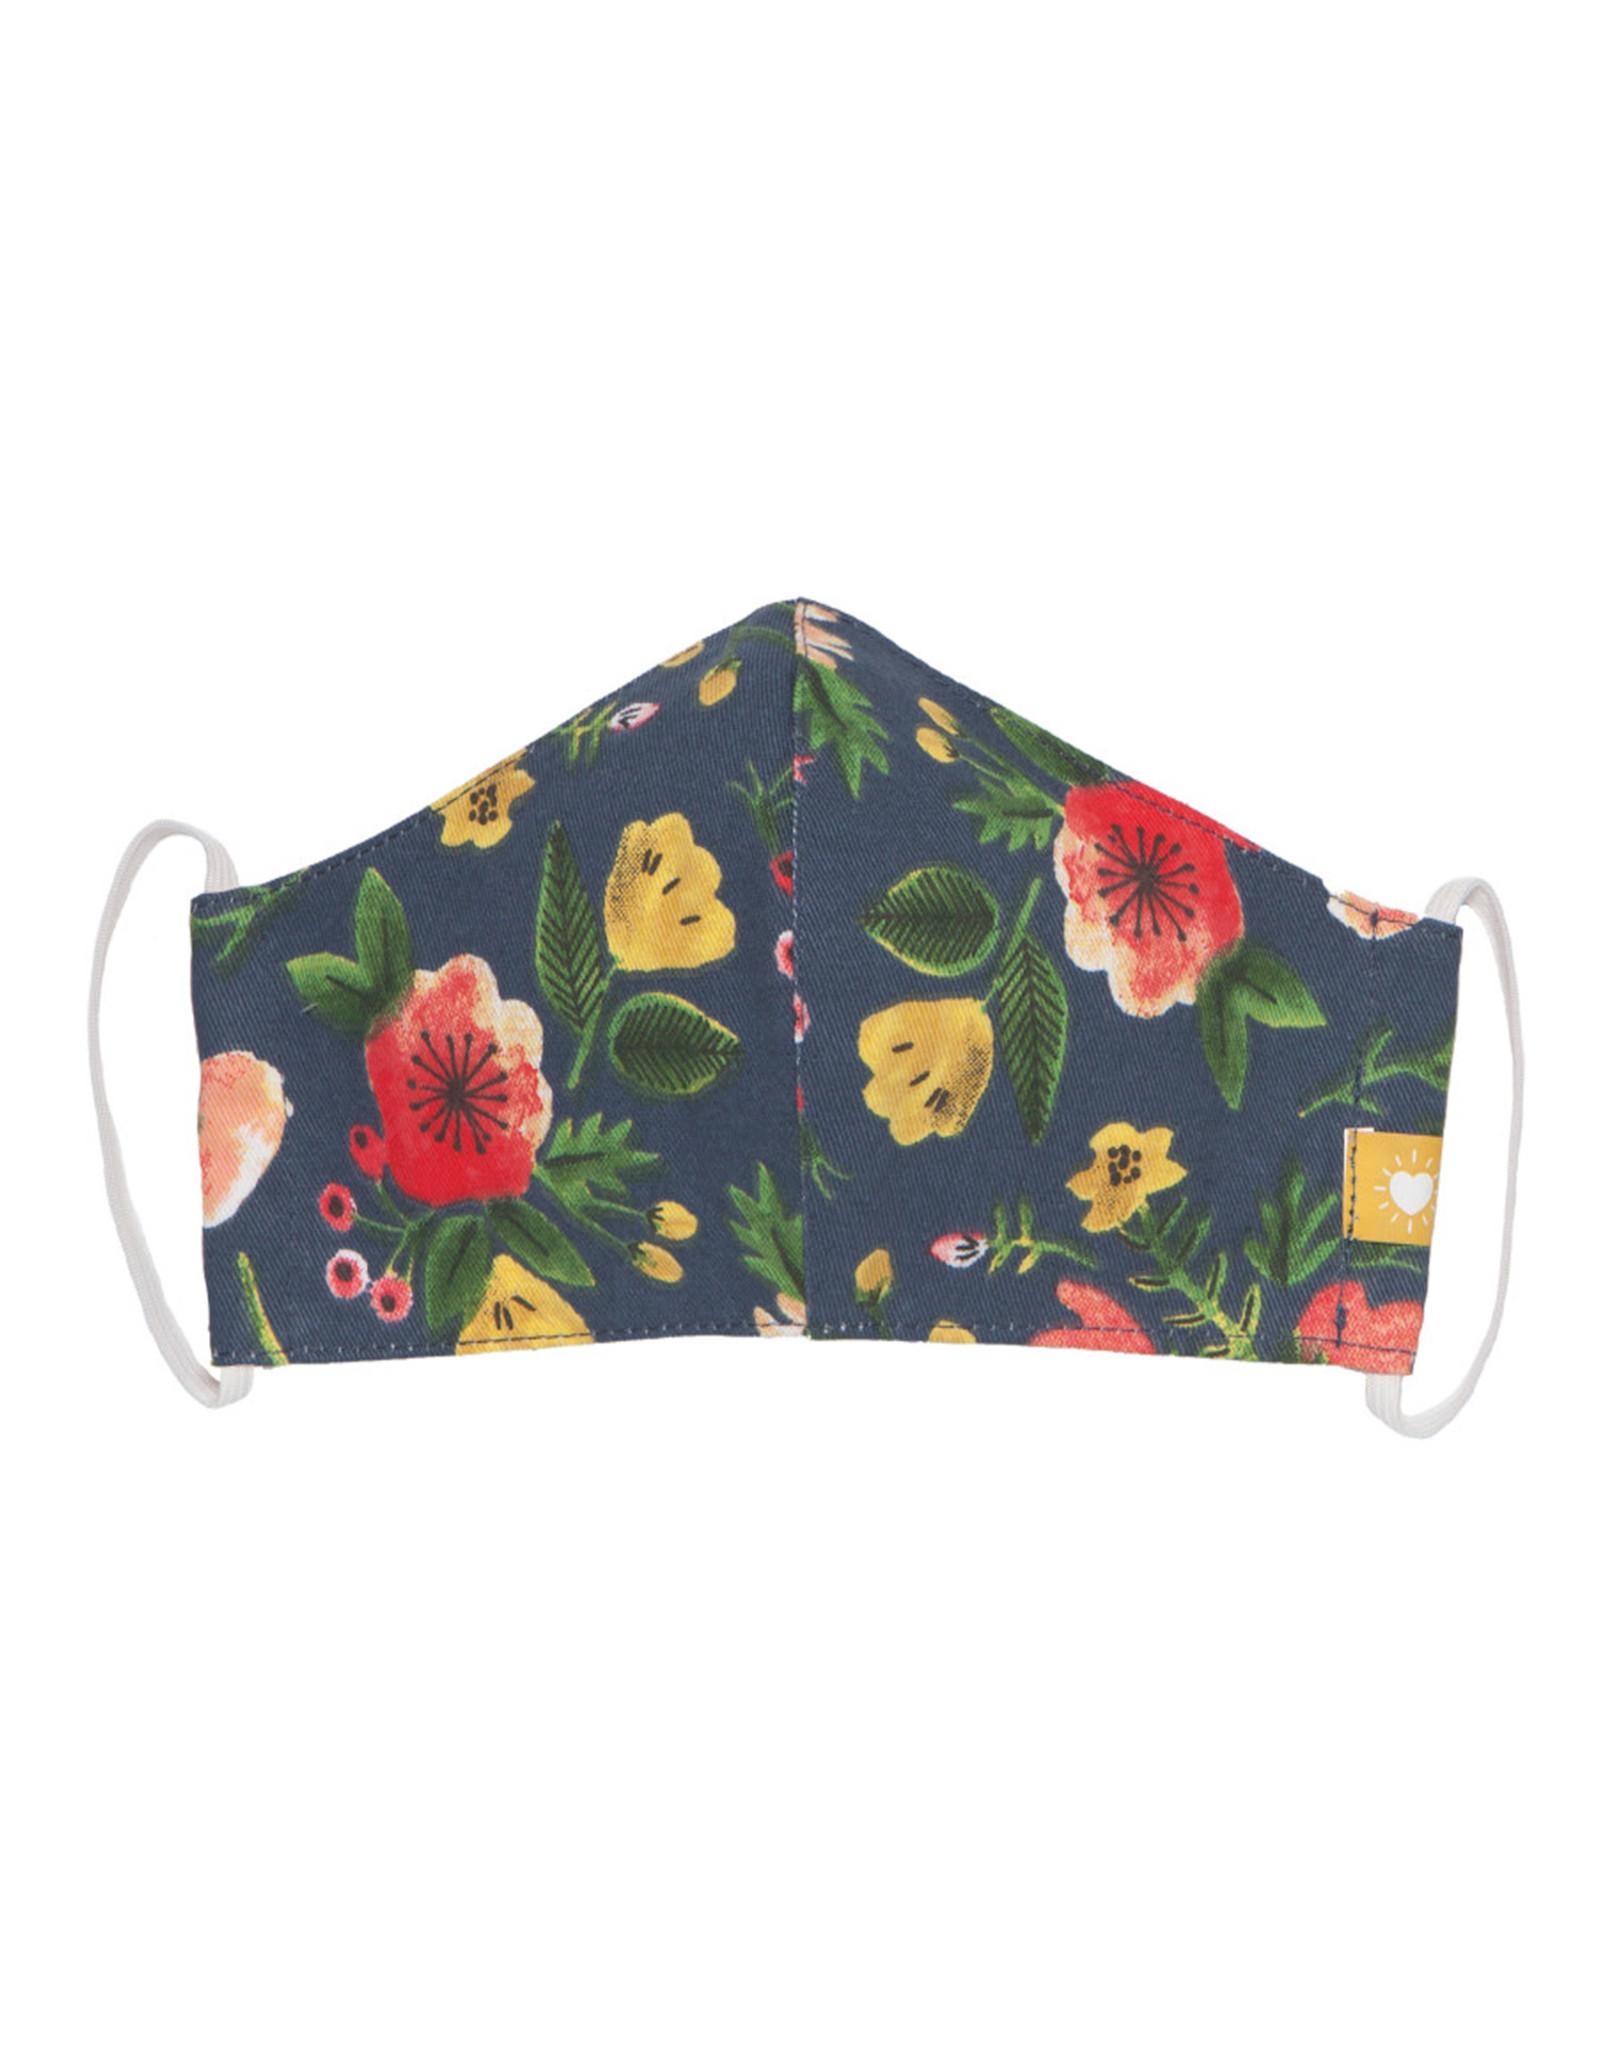 Danica Take Cover Face Masks, Midnight Garden